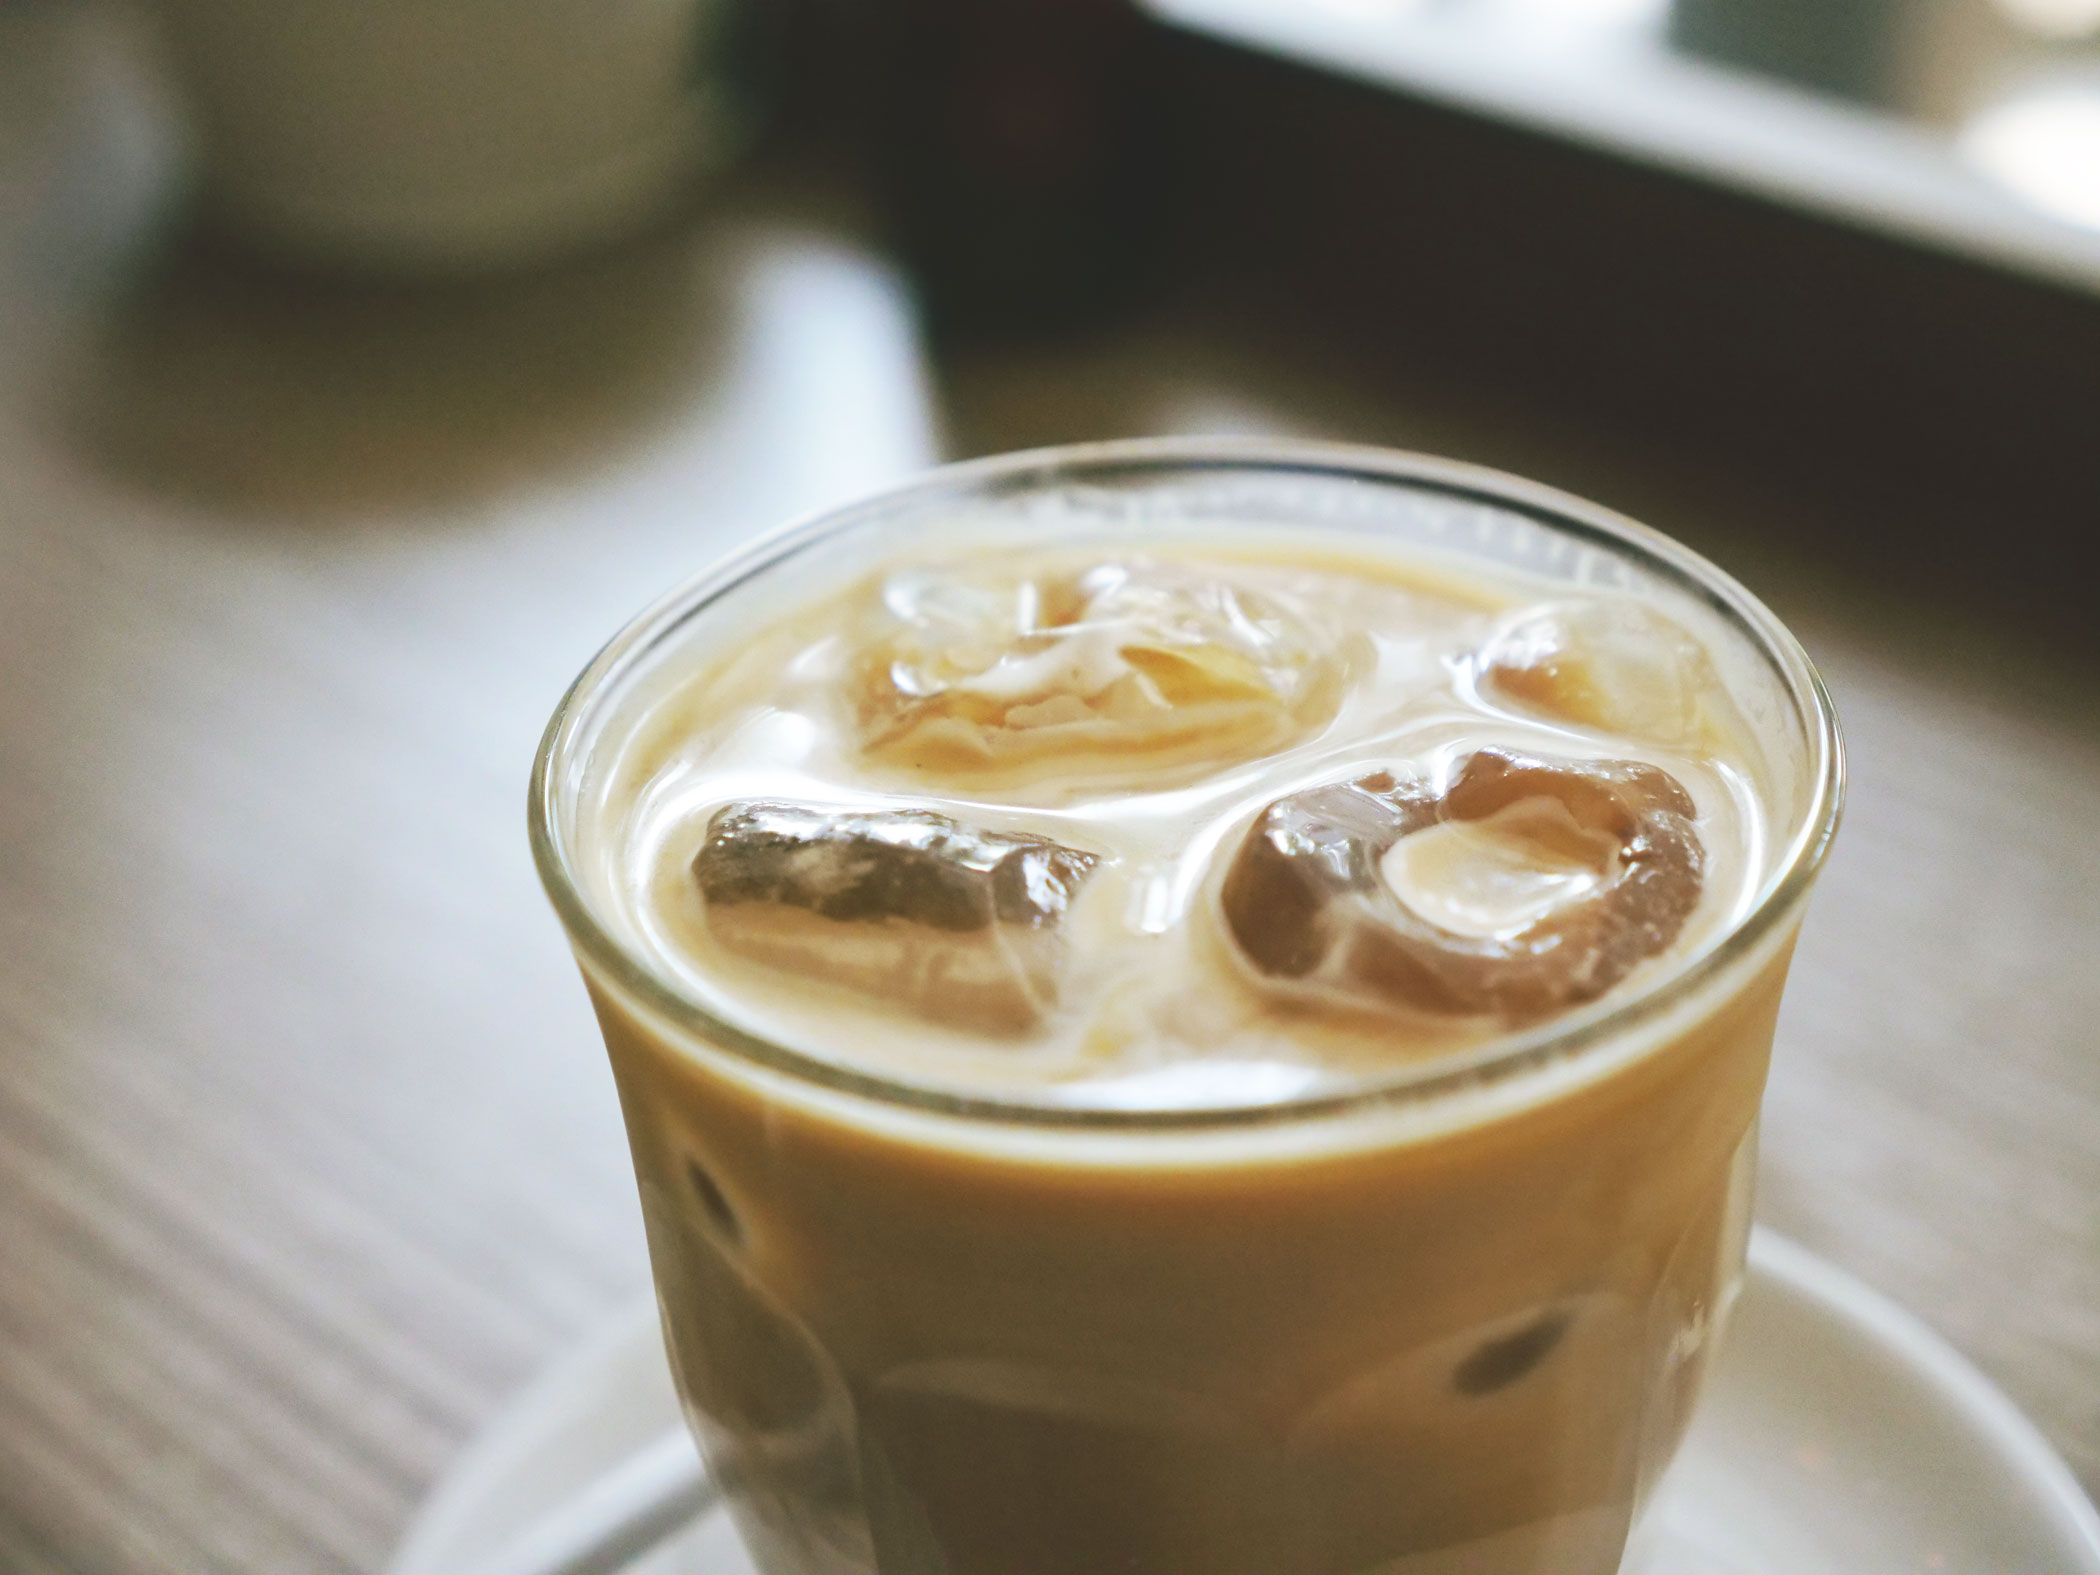 Specialty Coffee Kelapa Gading